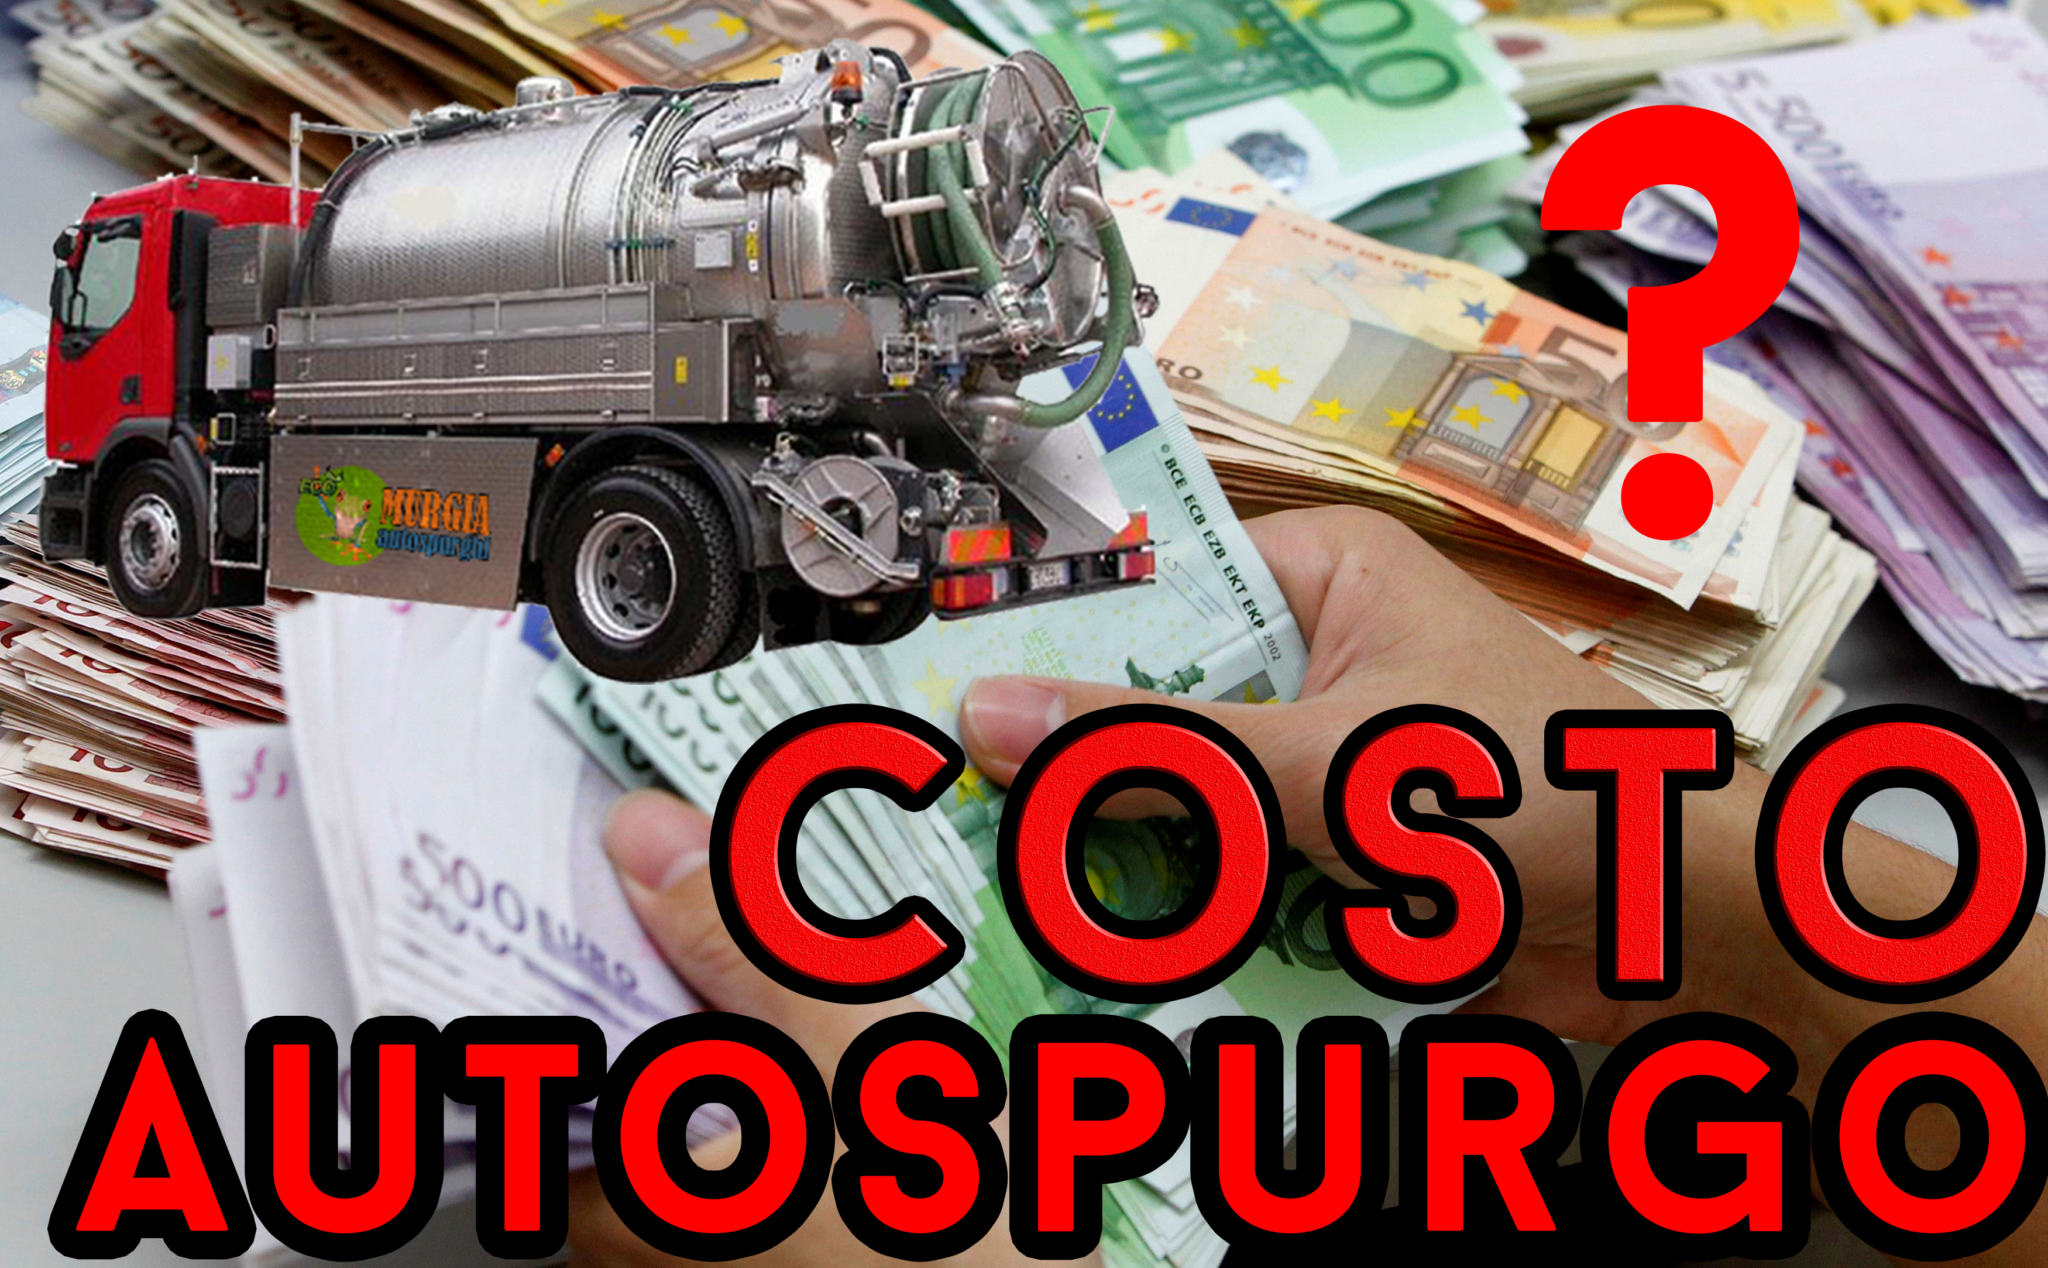 Costi Autospurgo Fossa Biologica Fognature Listino Prezzi